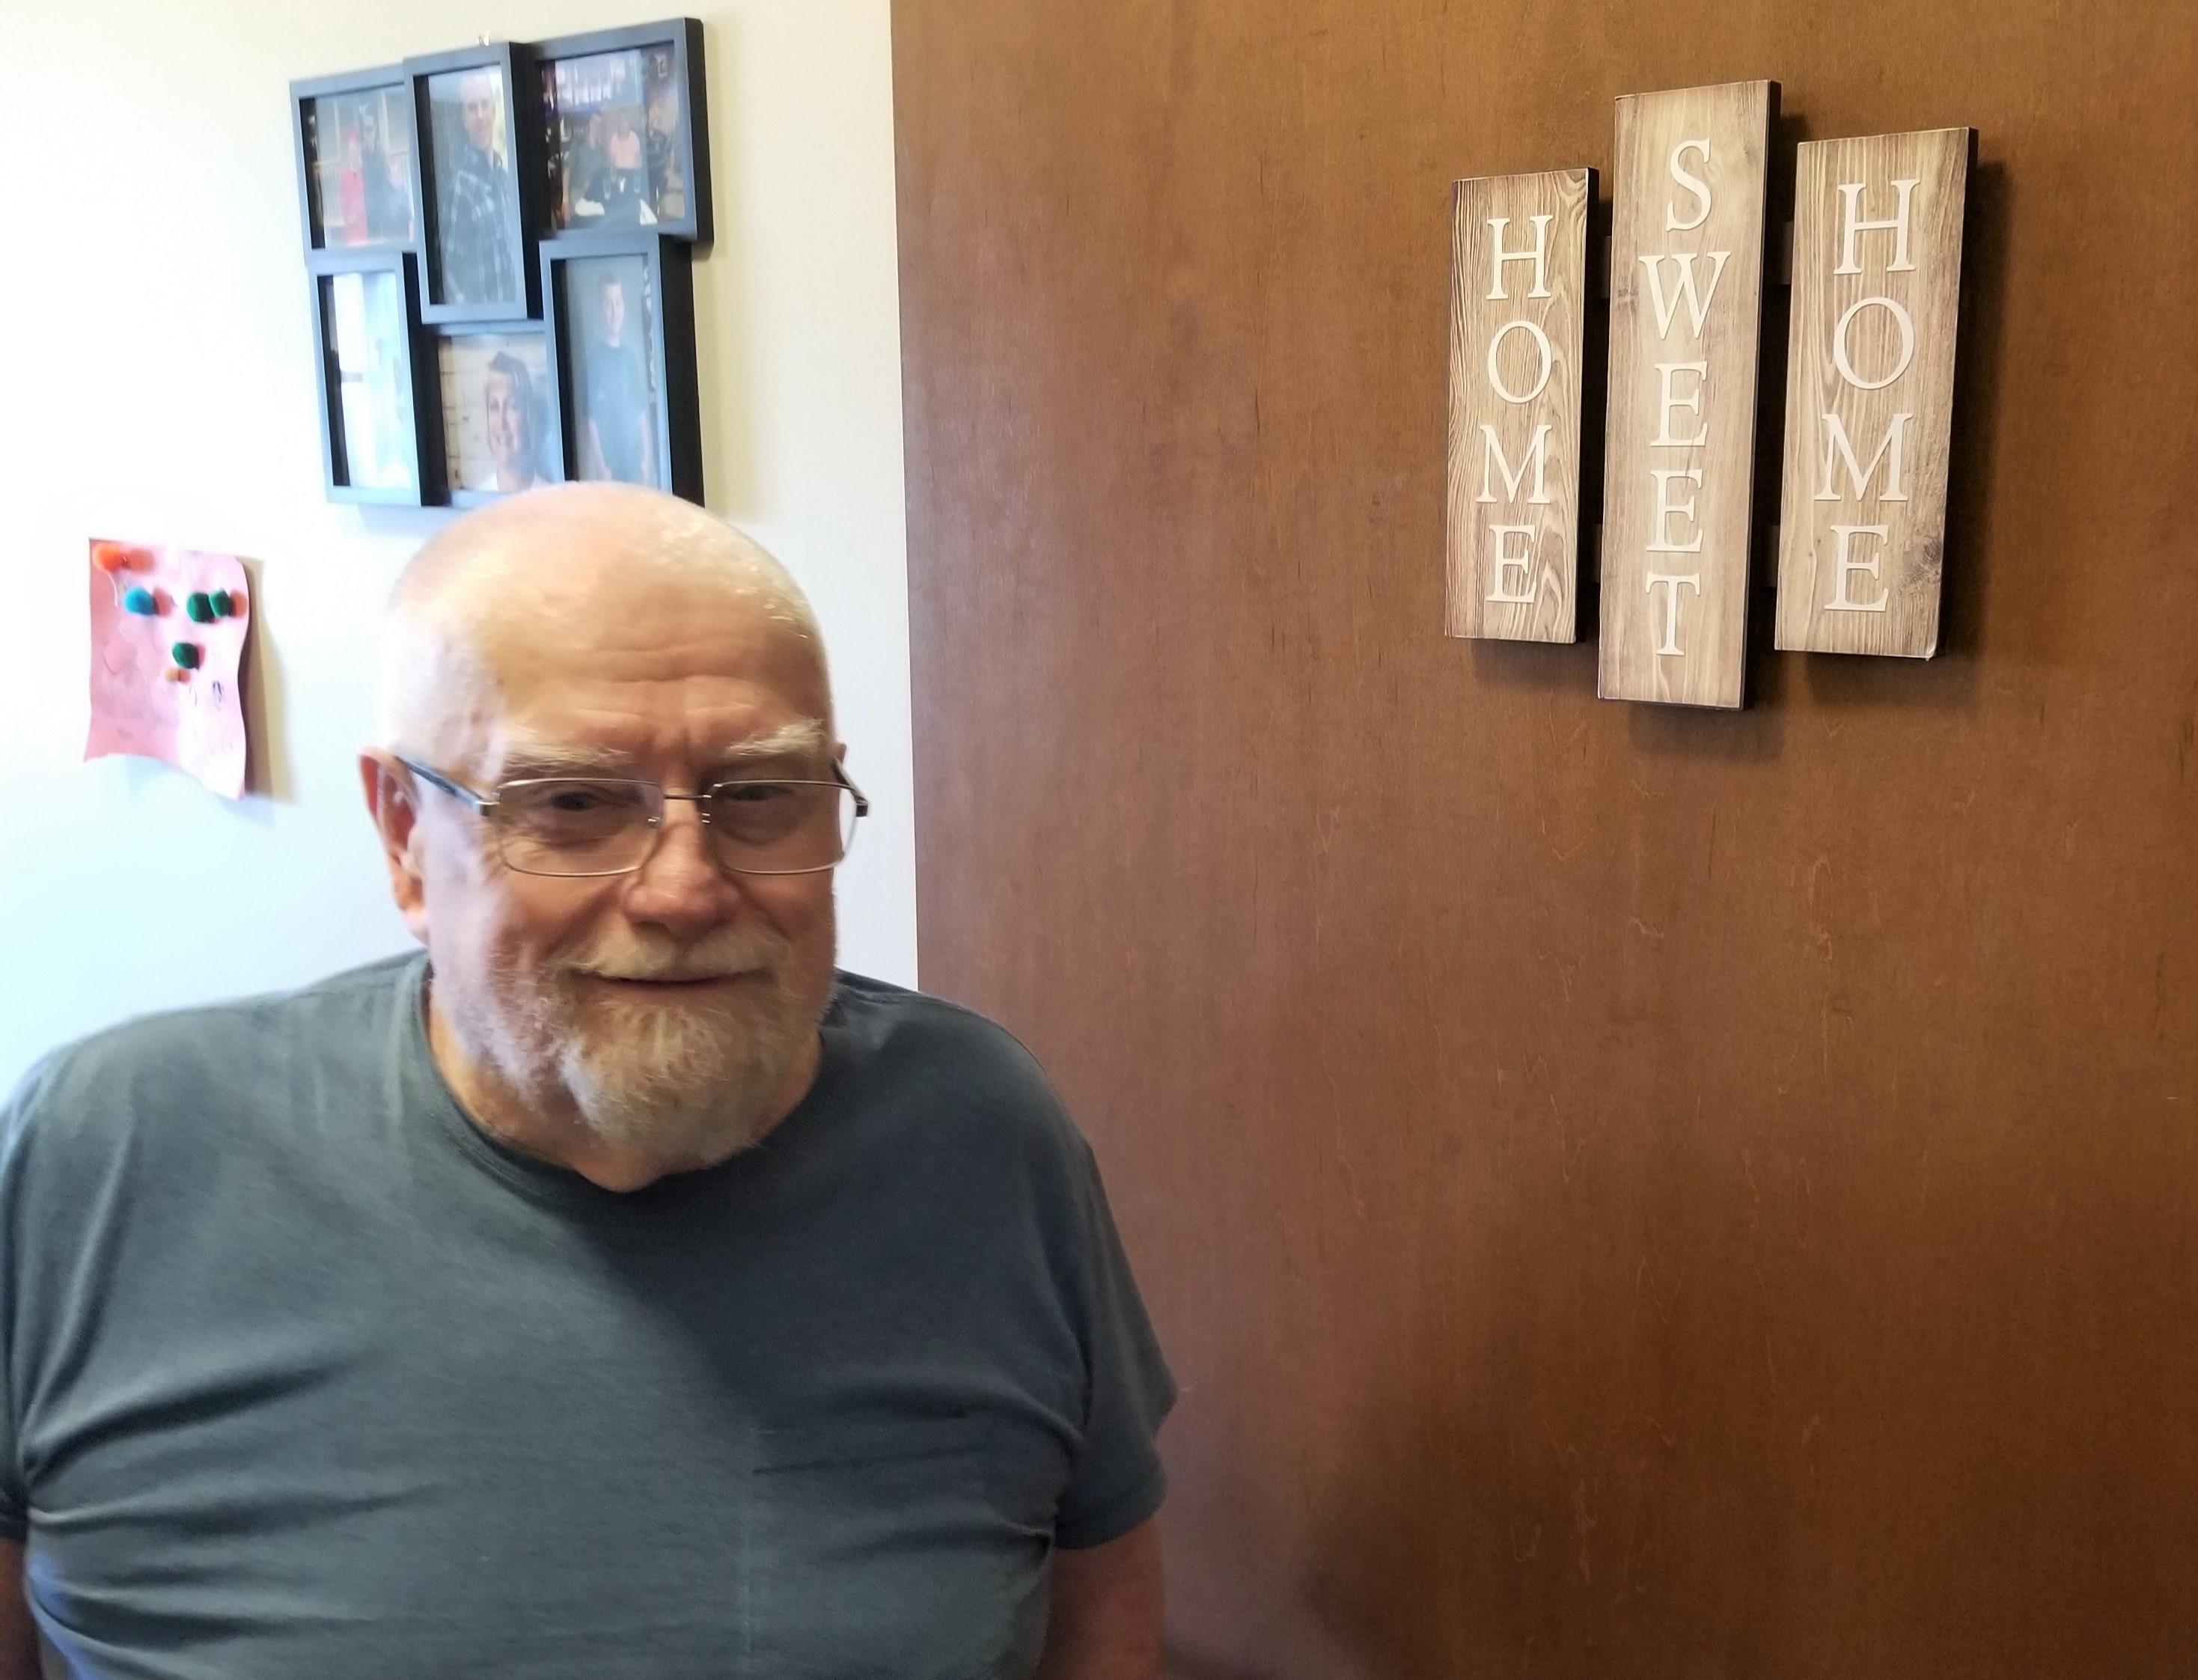 New senior residents find safe, welcoming community at Walker Methodist